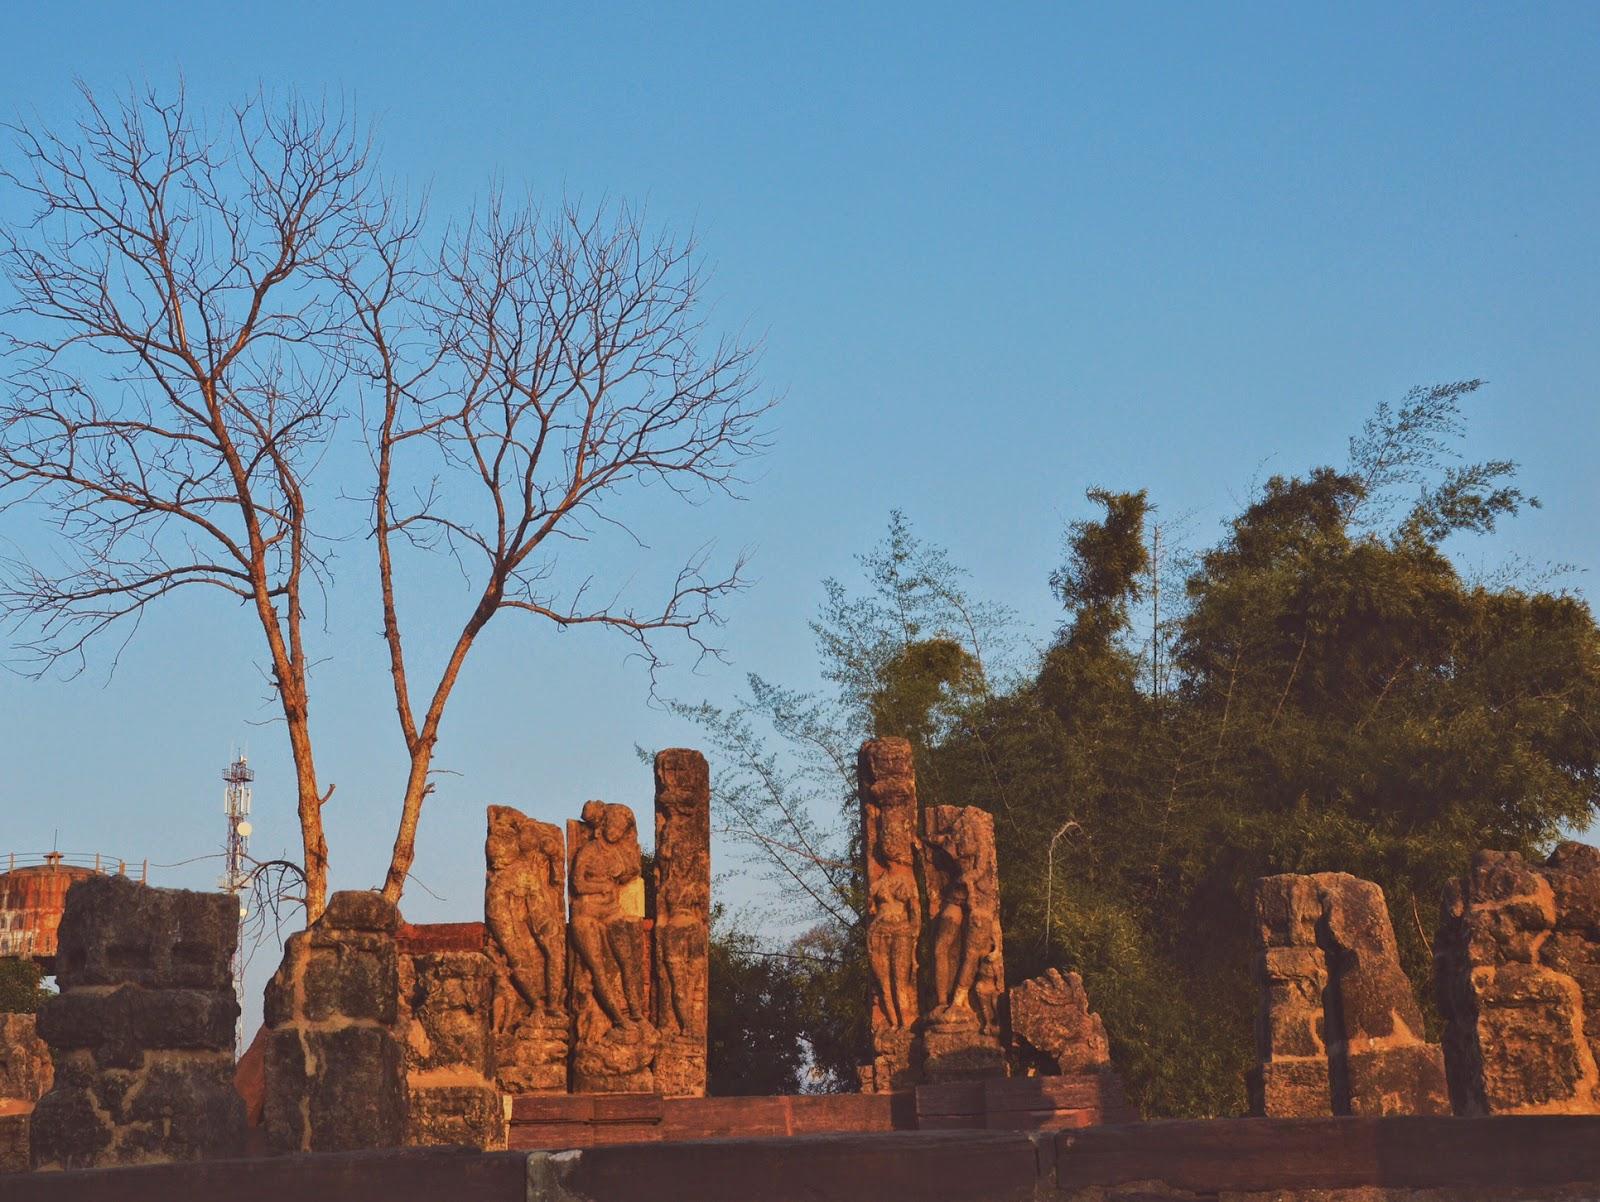 Balesvara Mahadev Temple Complex sirpur chhattisgarh travel tourism